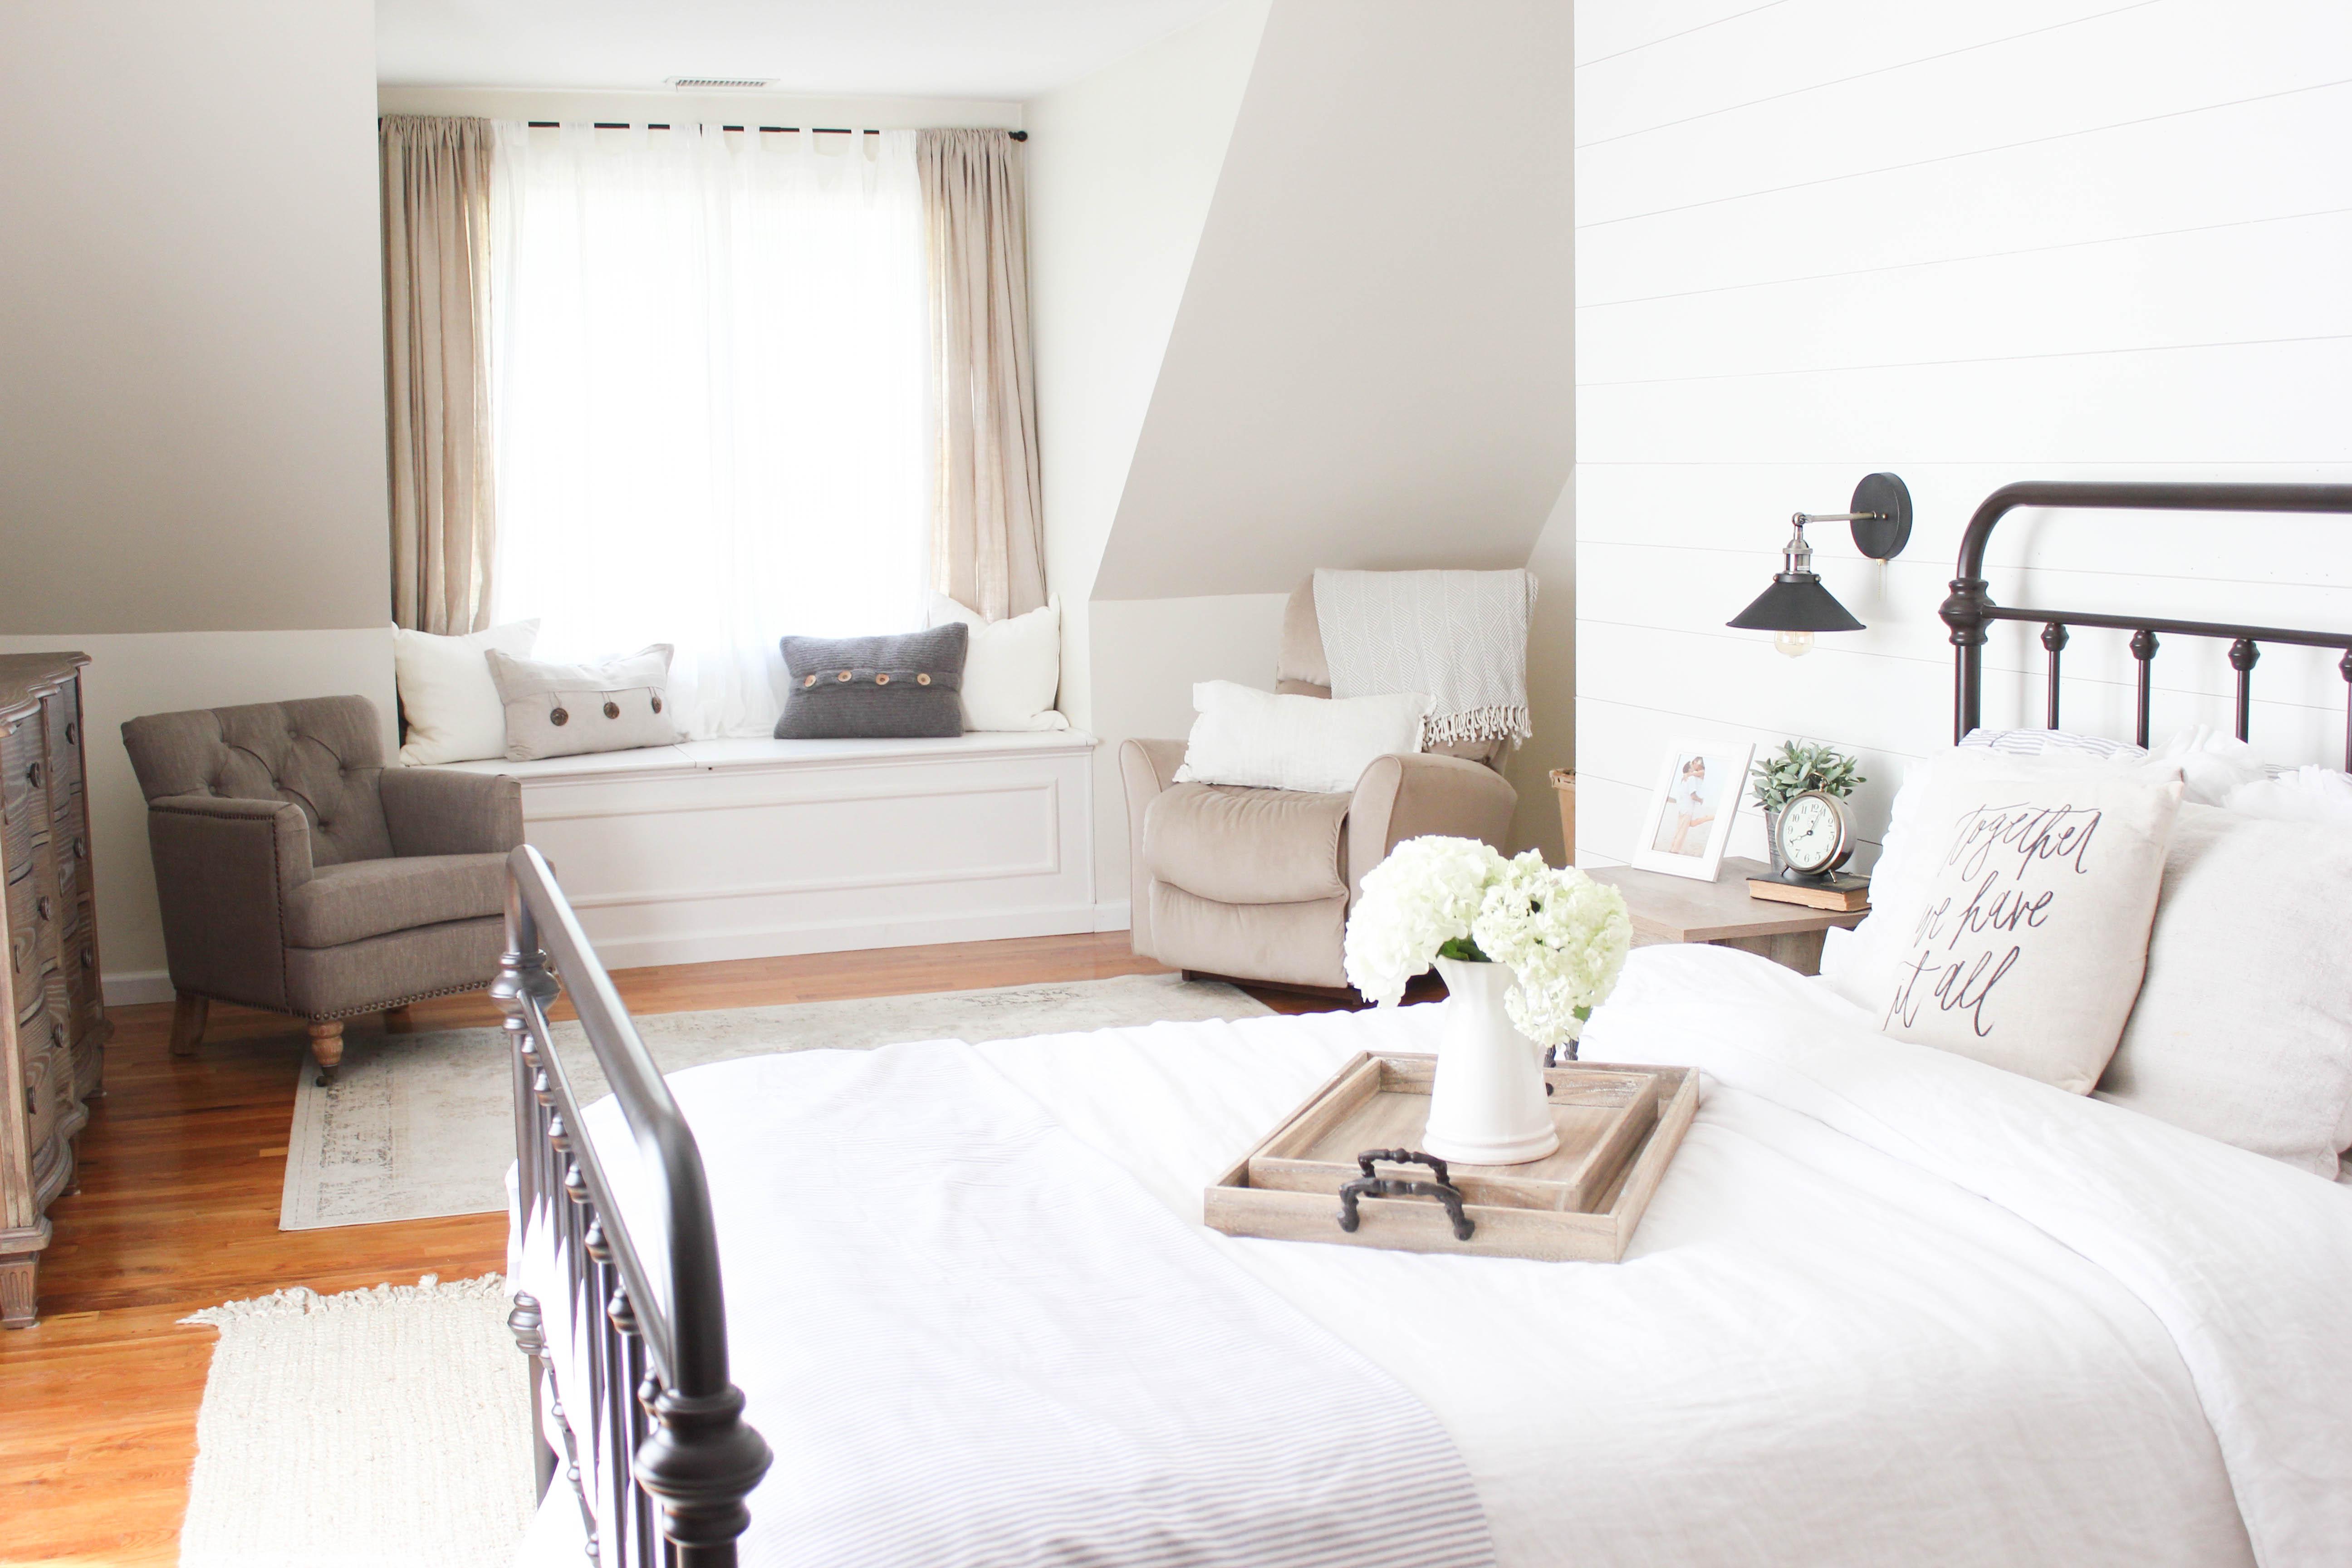 Home // Farmhouse Master Bedroom - Lauren McBride on Master Bedroom Farmhouse Bedroom Images  id=58863